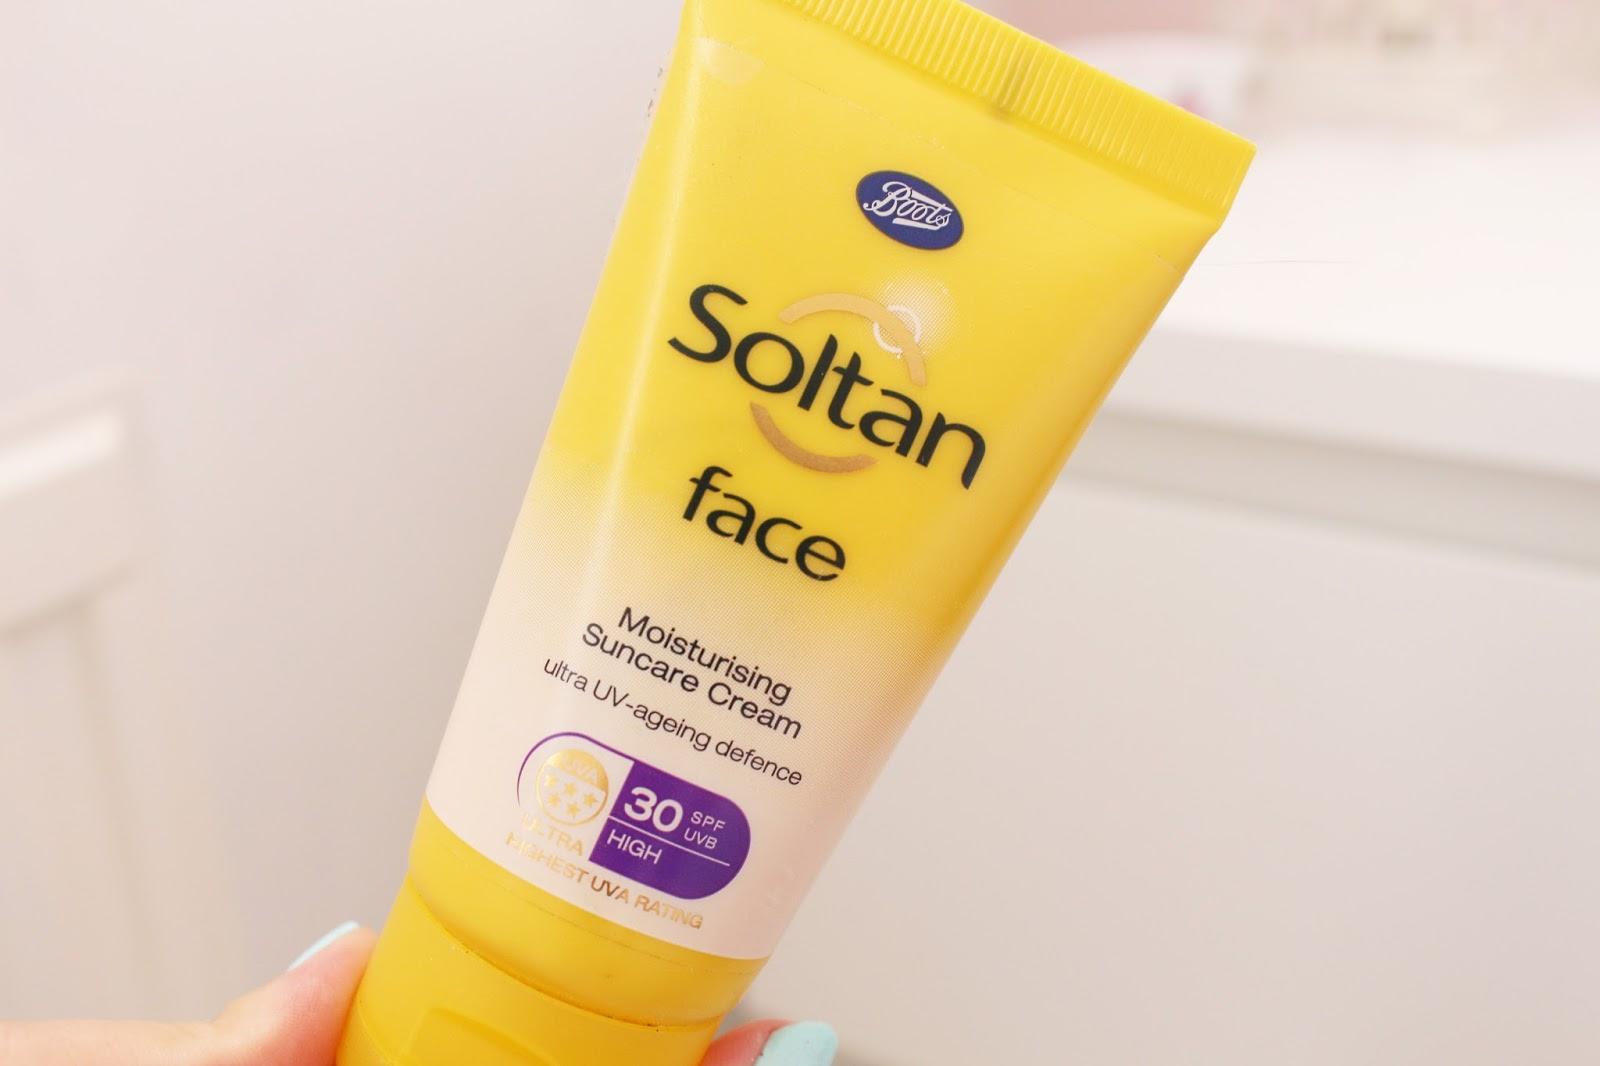 Boots Soltan Face SPF 30